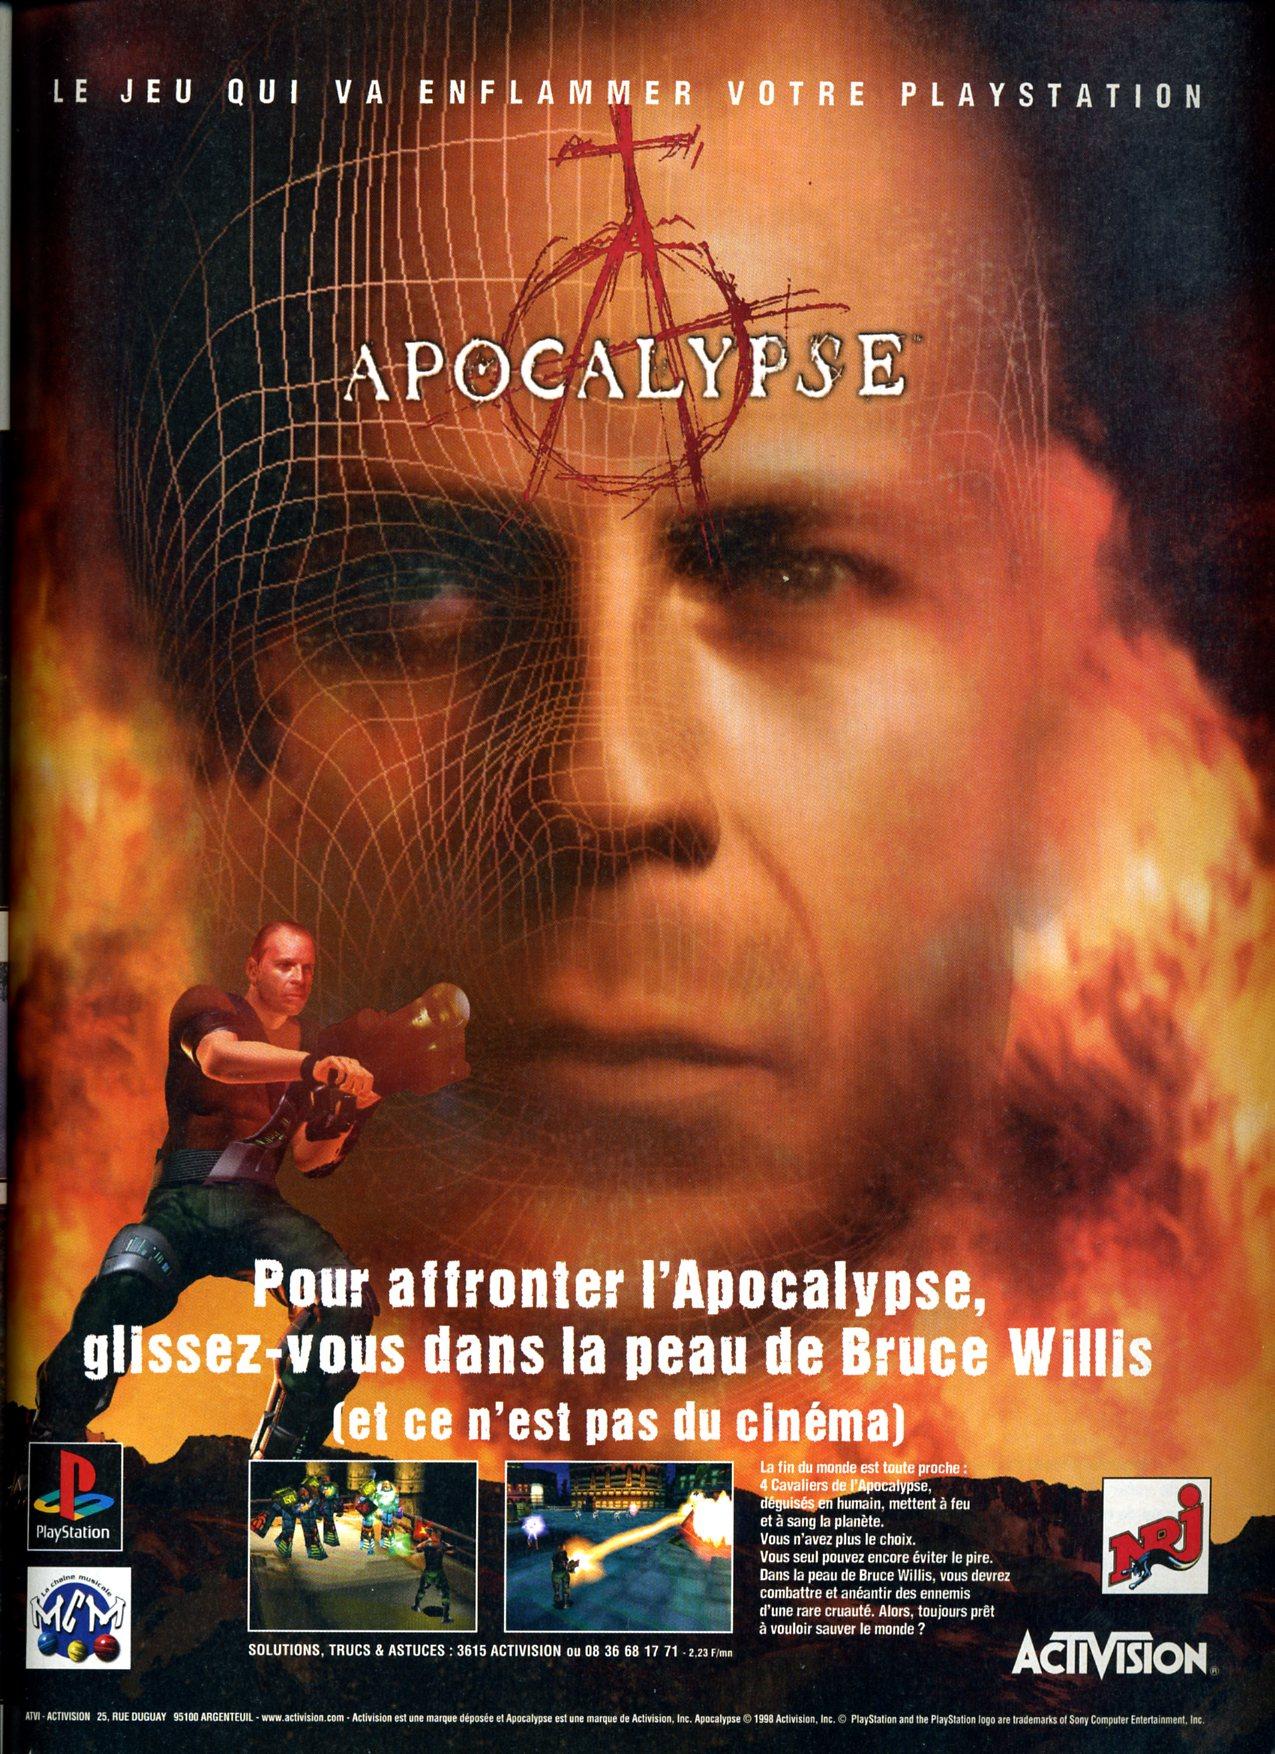 Apocalypse JOYPAD%2081%20decembre%201998%20037